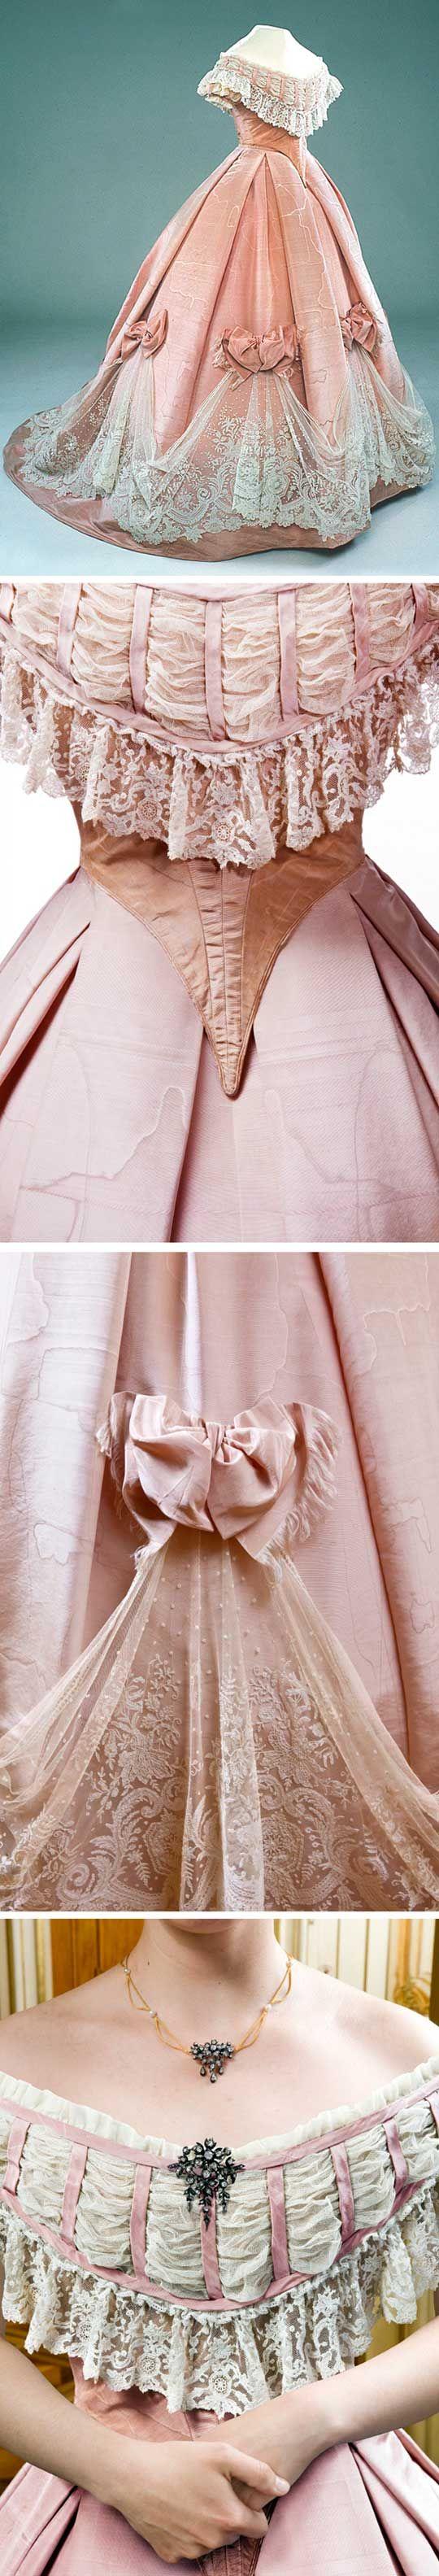 Twopiece dress sweden pink silk moiré with white bobbin